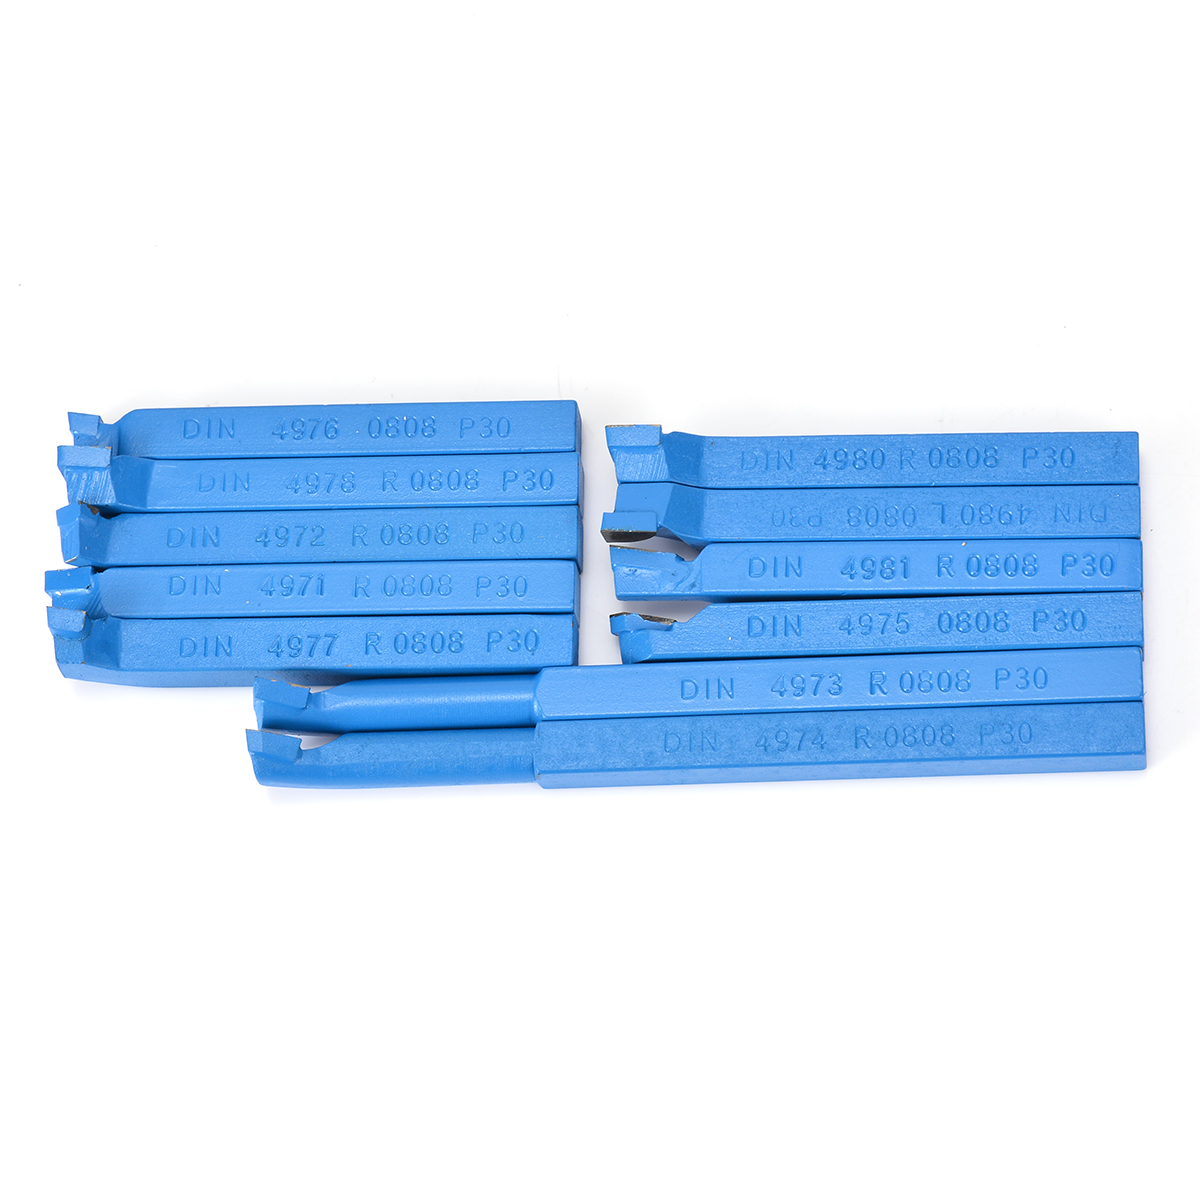 11 stücke 8*8mm Hartmetall Spitze Gekippt Bit Set Gelötete Fräser Werkzeuge Für Metall CNC Drehmaschine